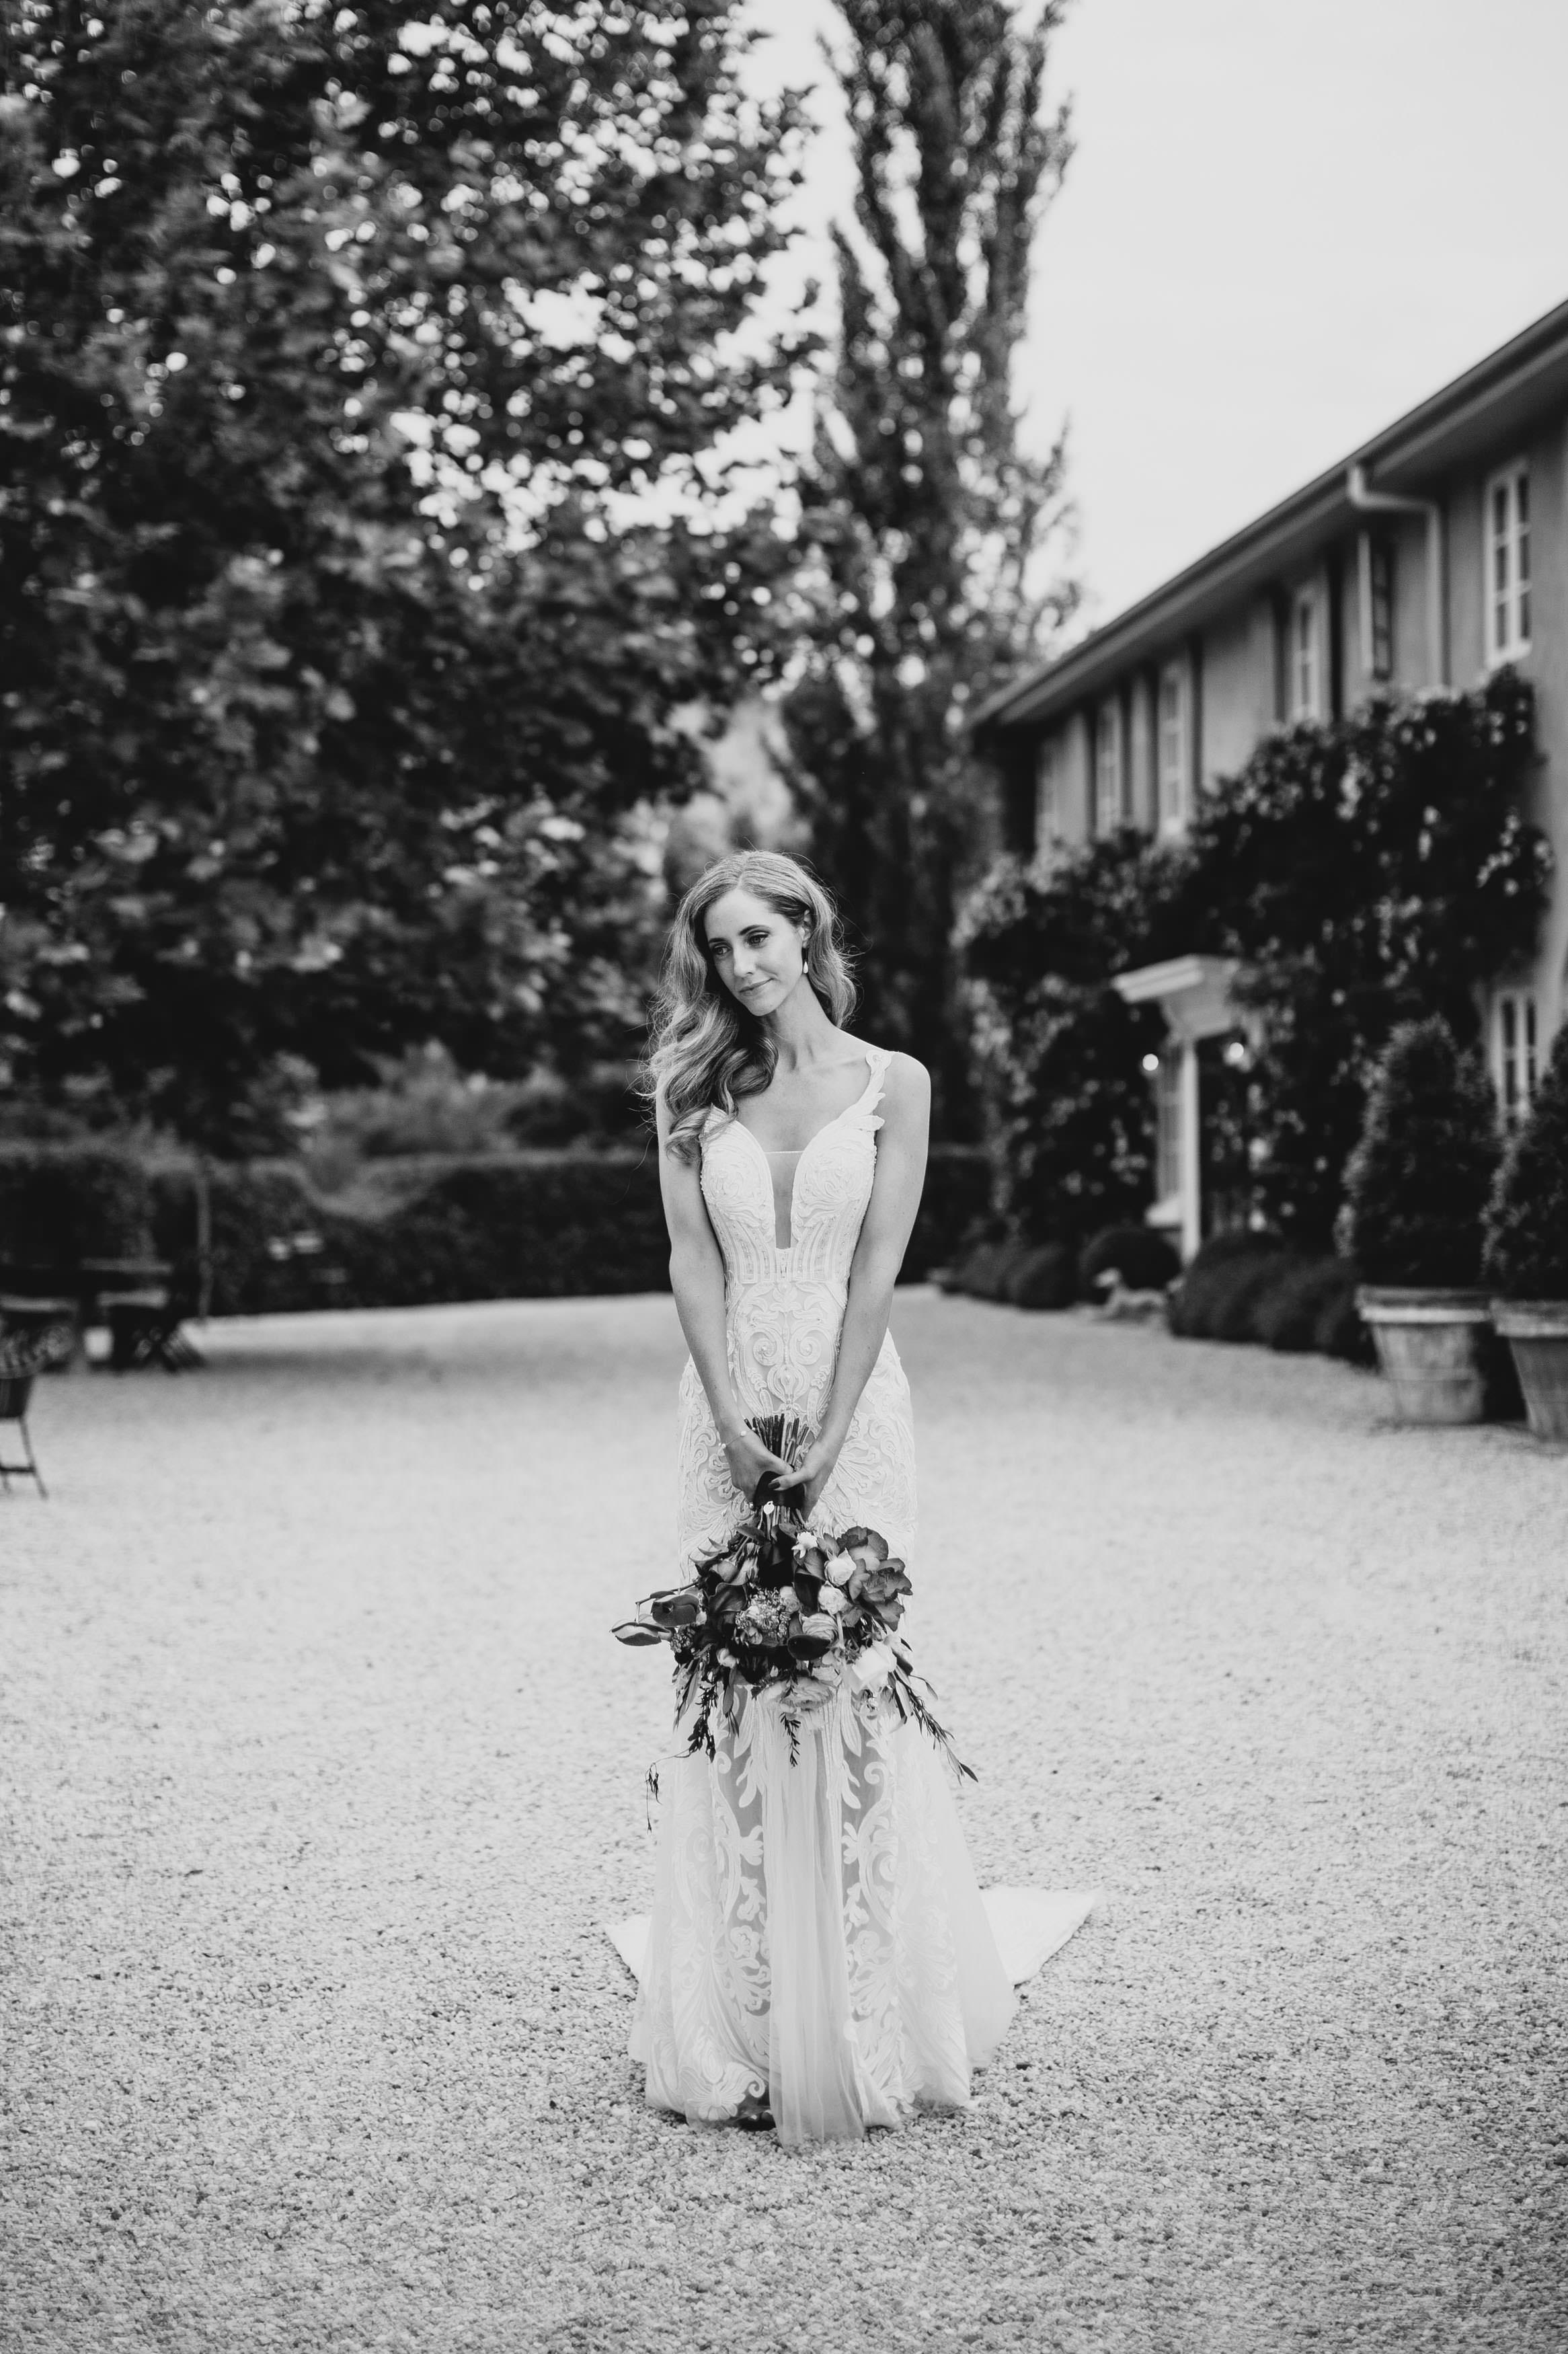 074_hunter_valley_wedding_photography_redleaf_paul_bamford_finchandoak.jpg